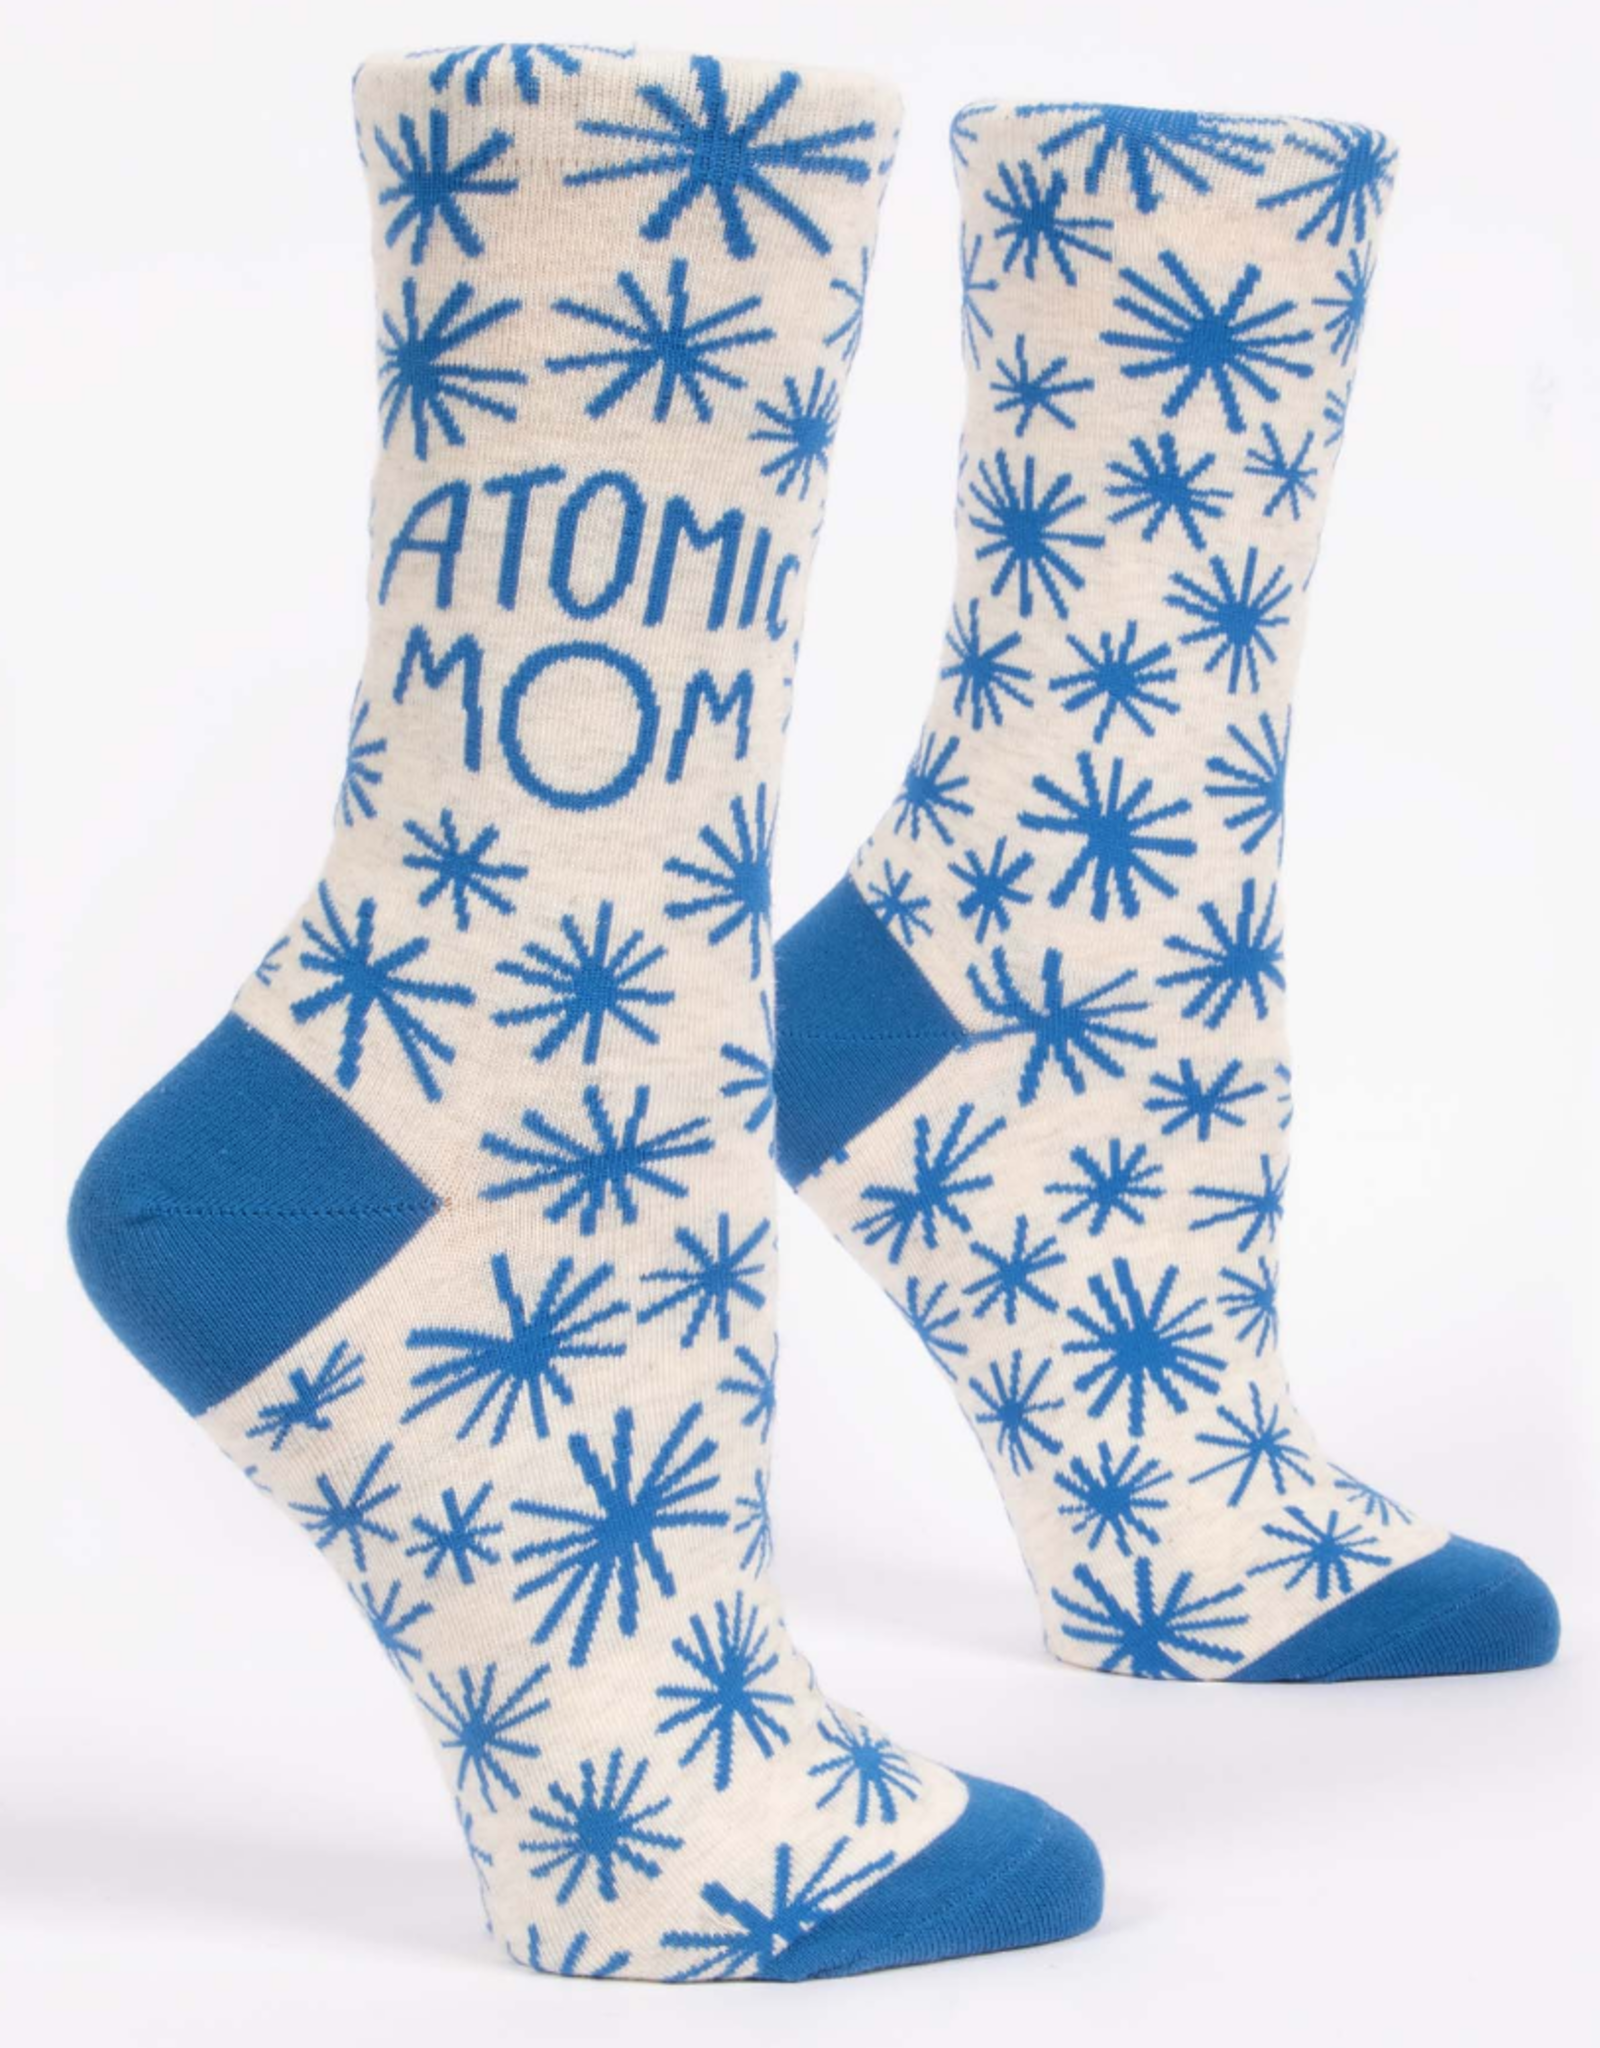 Blue Q Blue Q - Crew Socks Atomic Mom